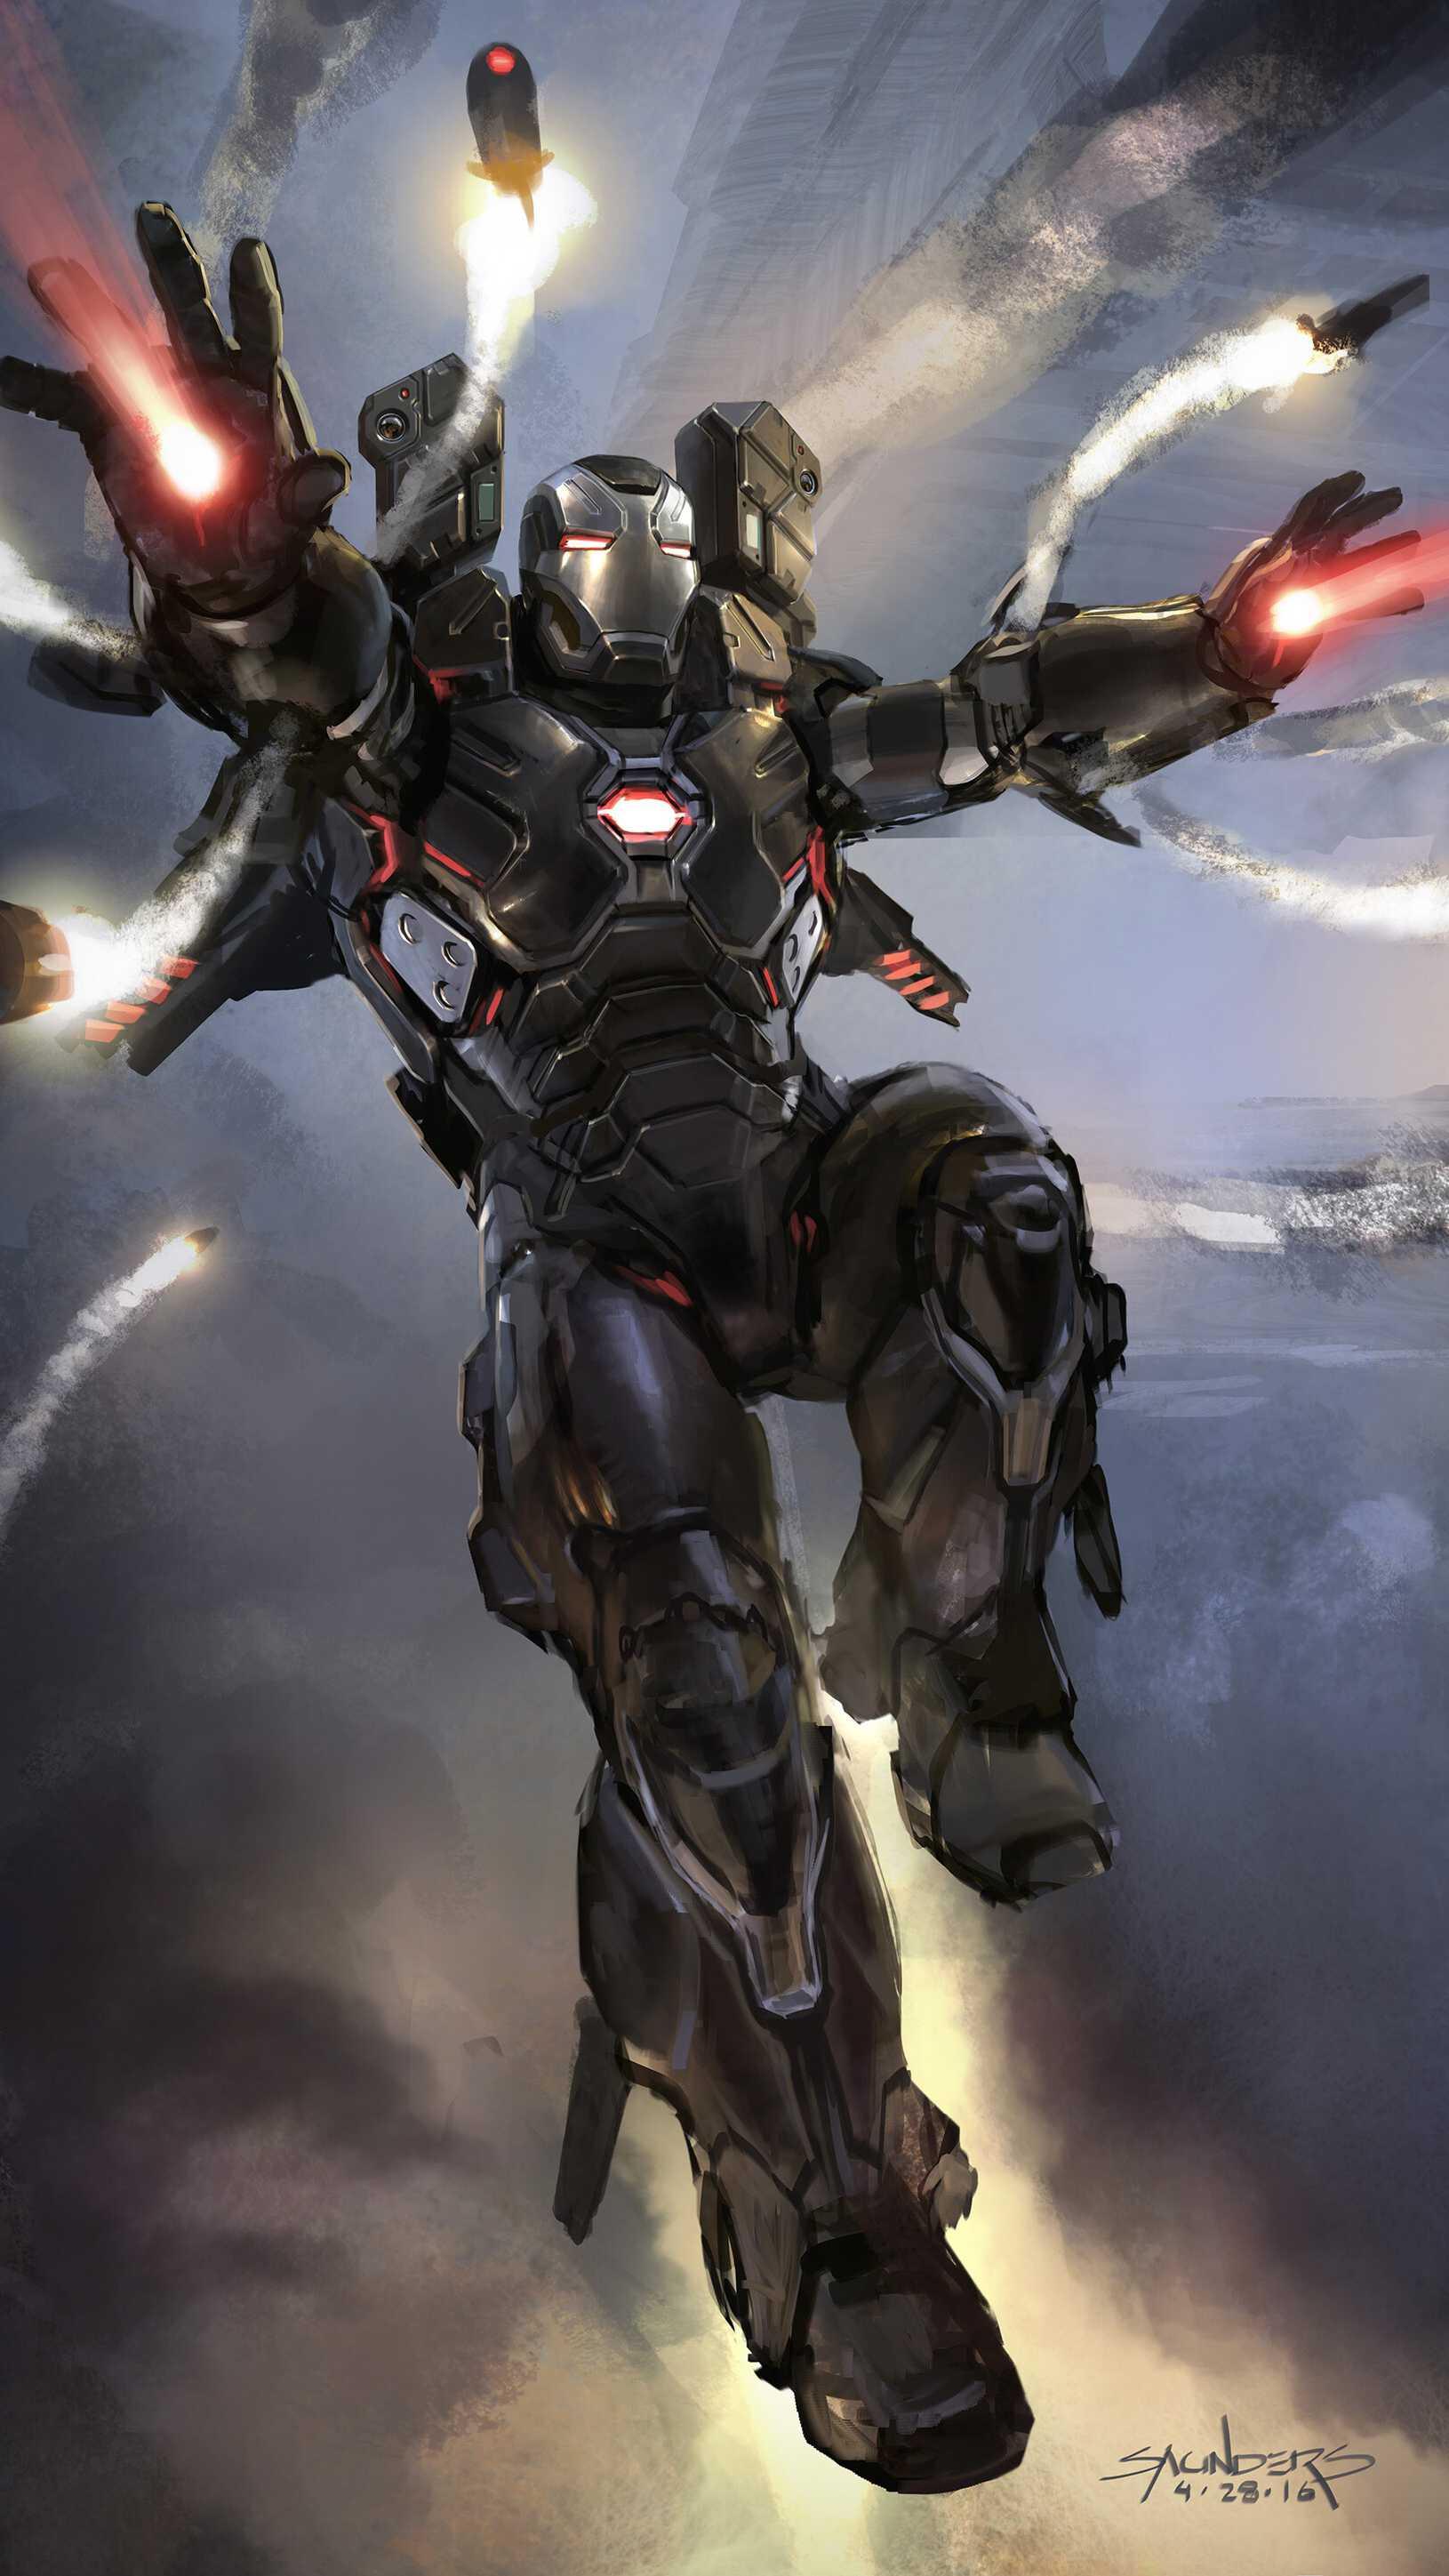 Avengers Endgame War Machine Action iPhone Wallpaper